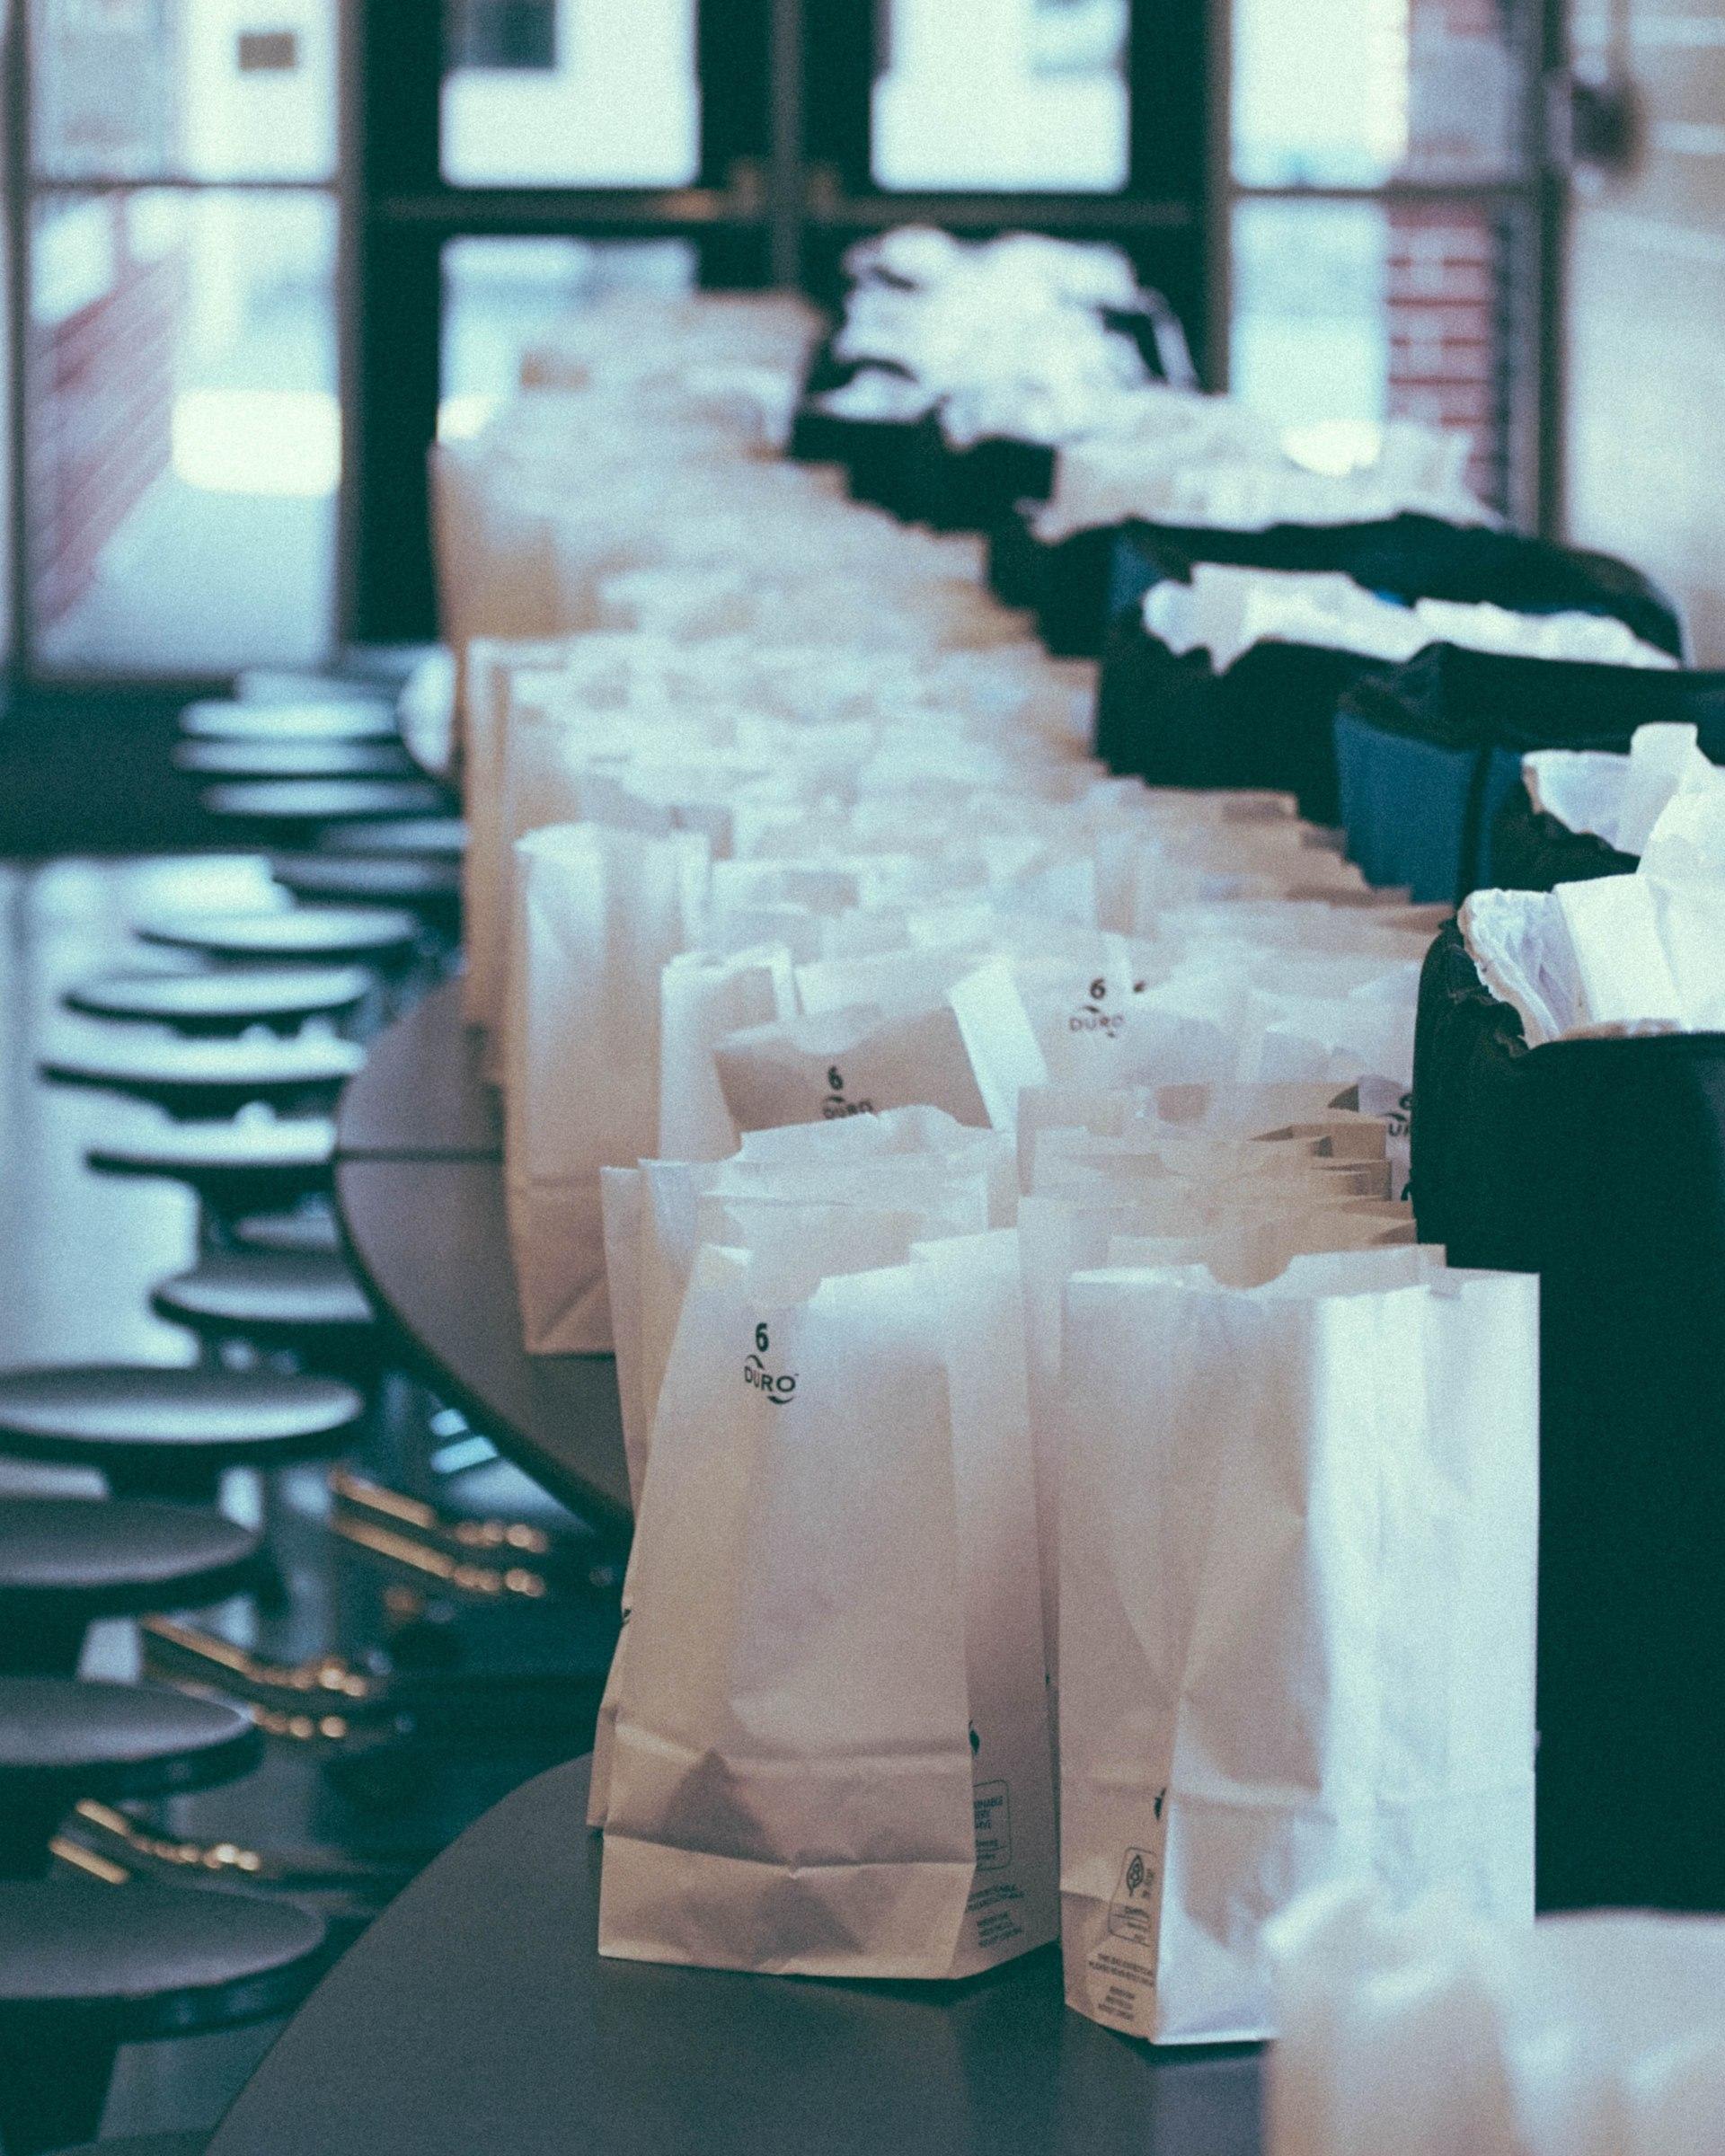 3/24/2020, Meal Distribution